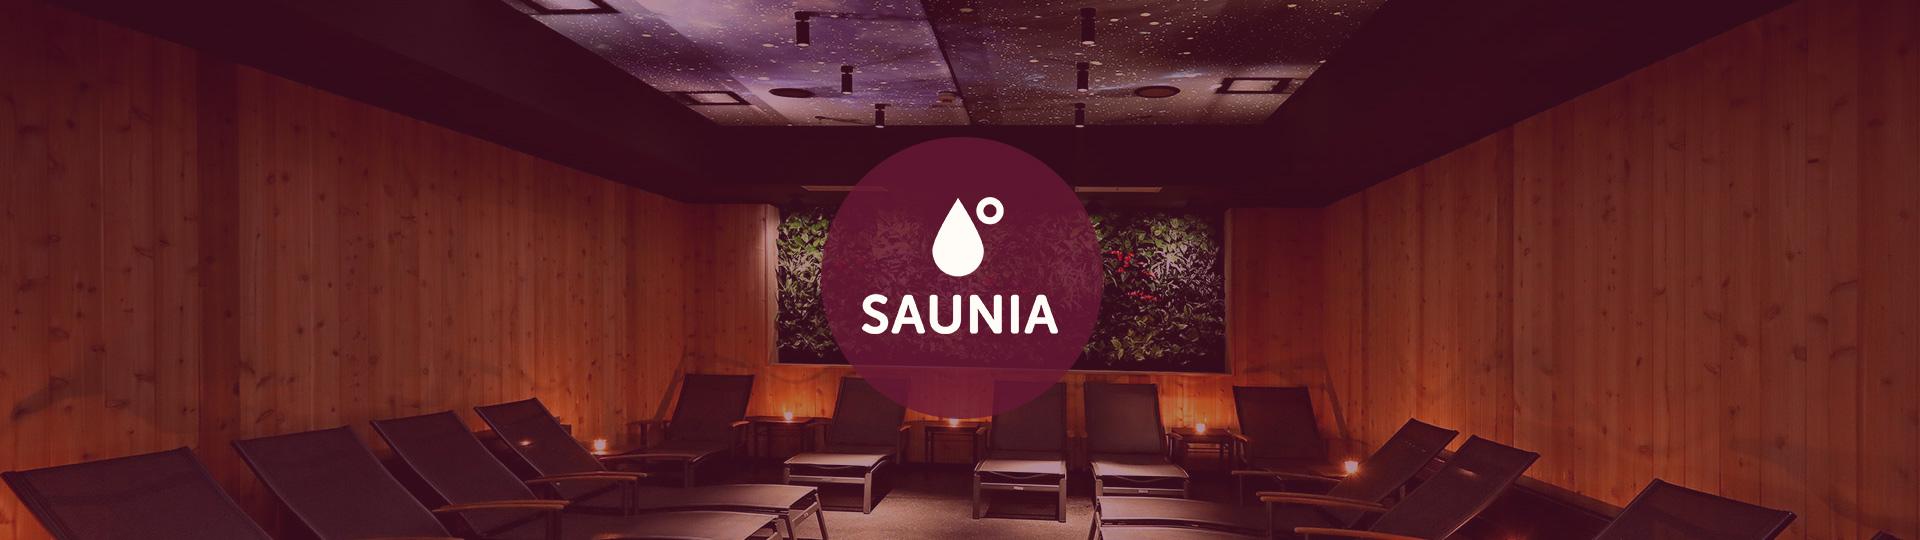 Saunia 6,25/2022